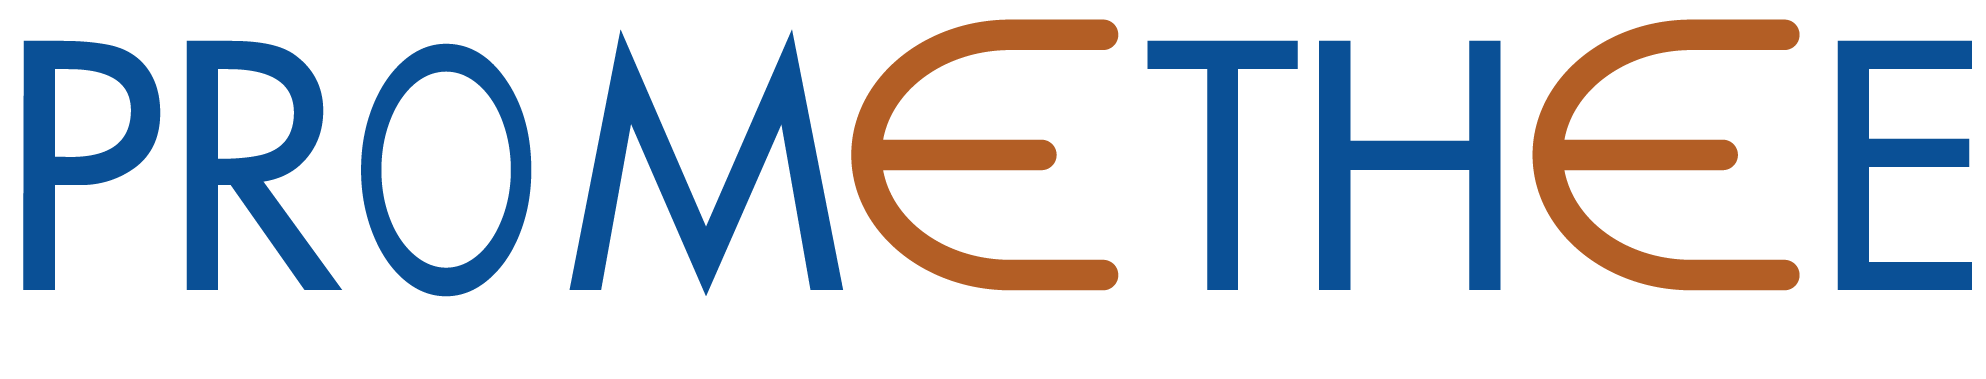 PROMETHEE Logo